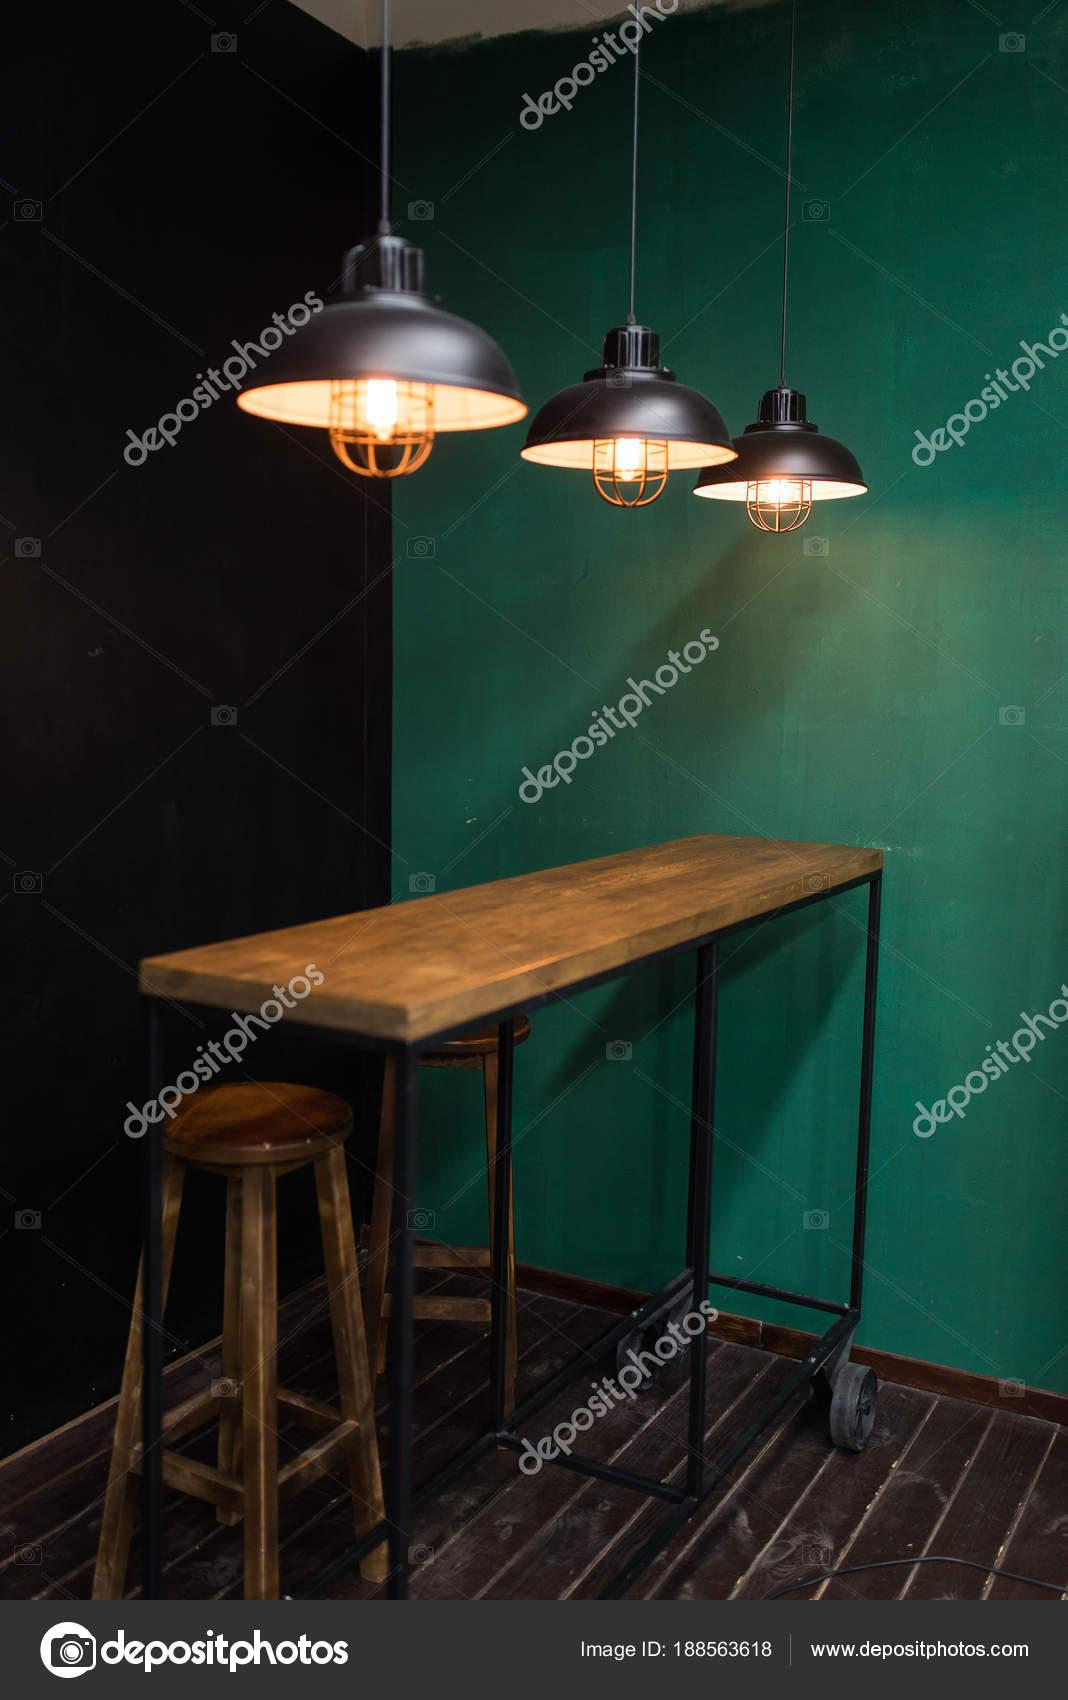 kitchen bar lights oak cabinet doors 在厨房的车轮上的酒吧架上挂灯和木制酒吧凳子在绿色和黑色的墙壁的背景下 在厨房的车轮上的酒吧架上挂灯和木制酒吧凳子